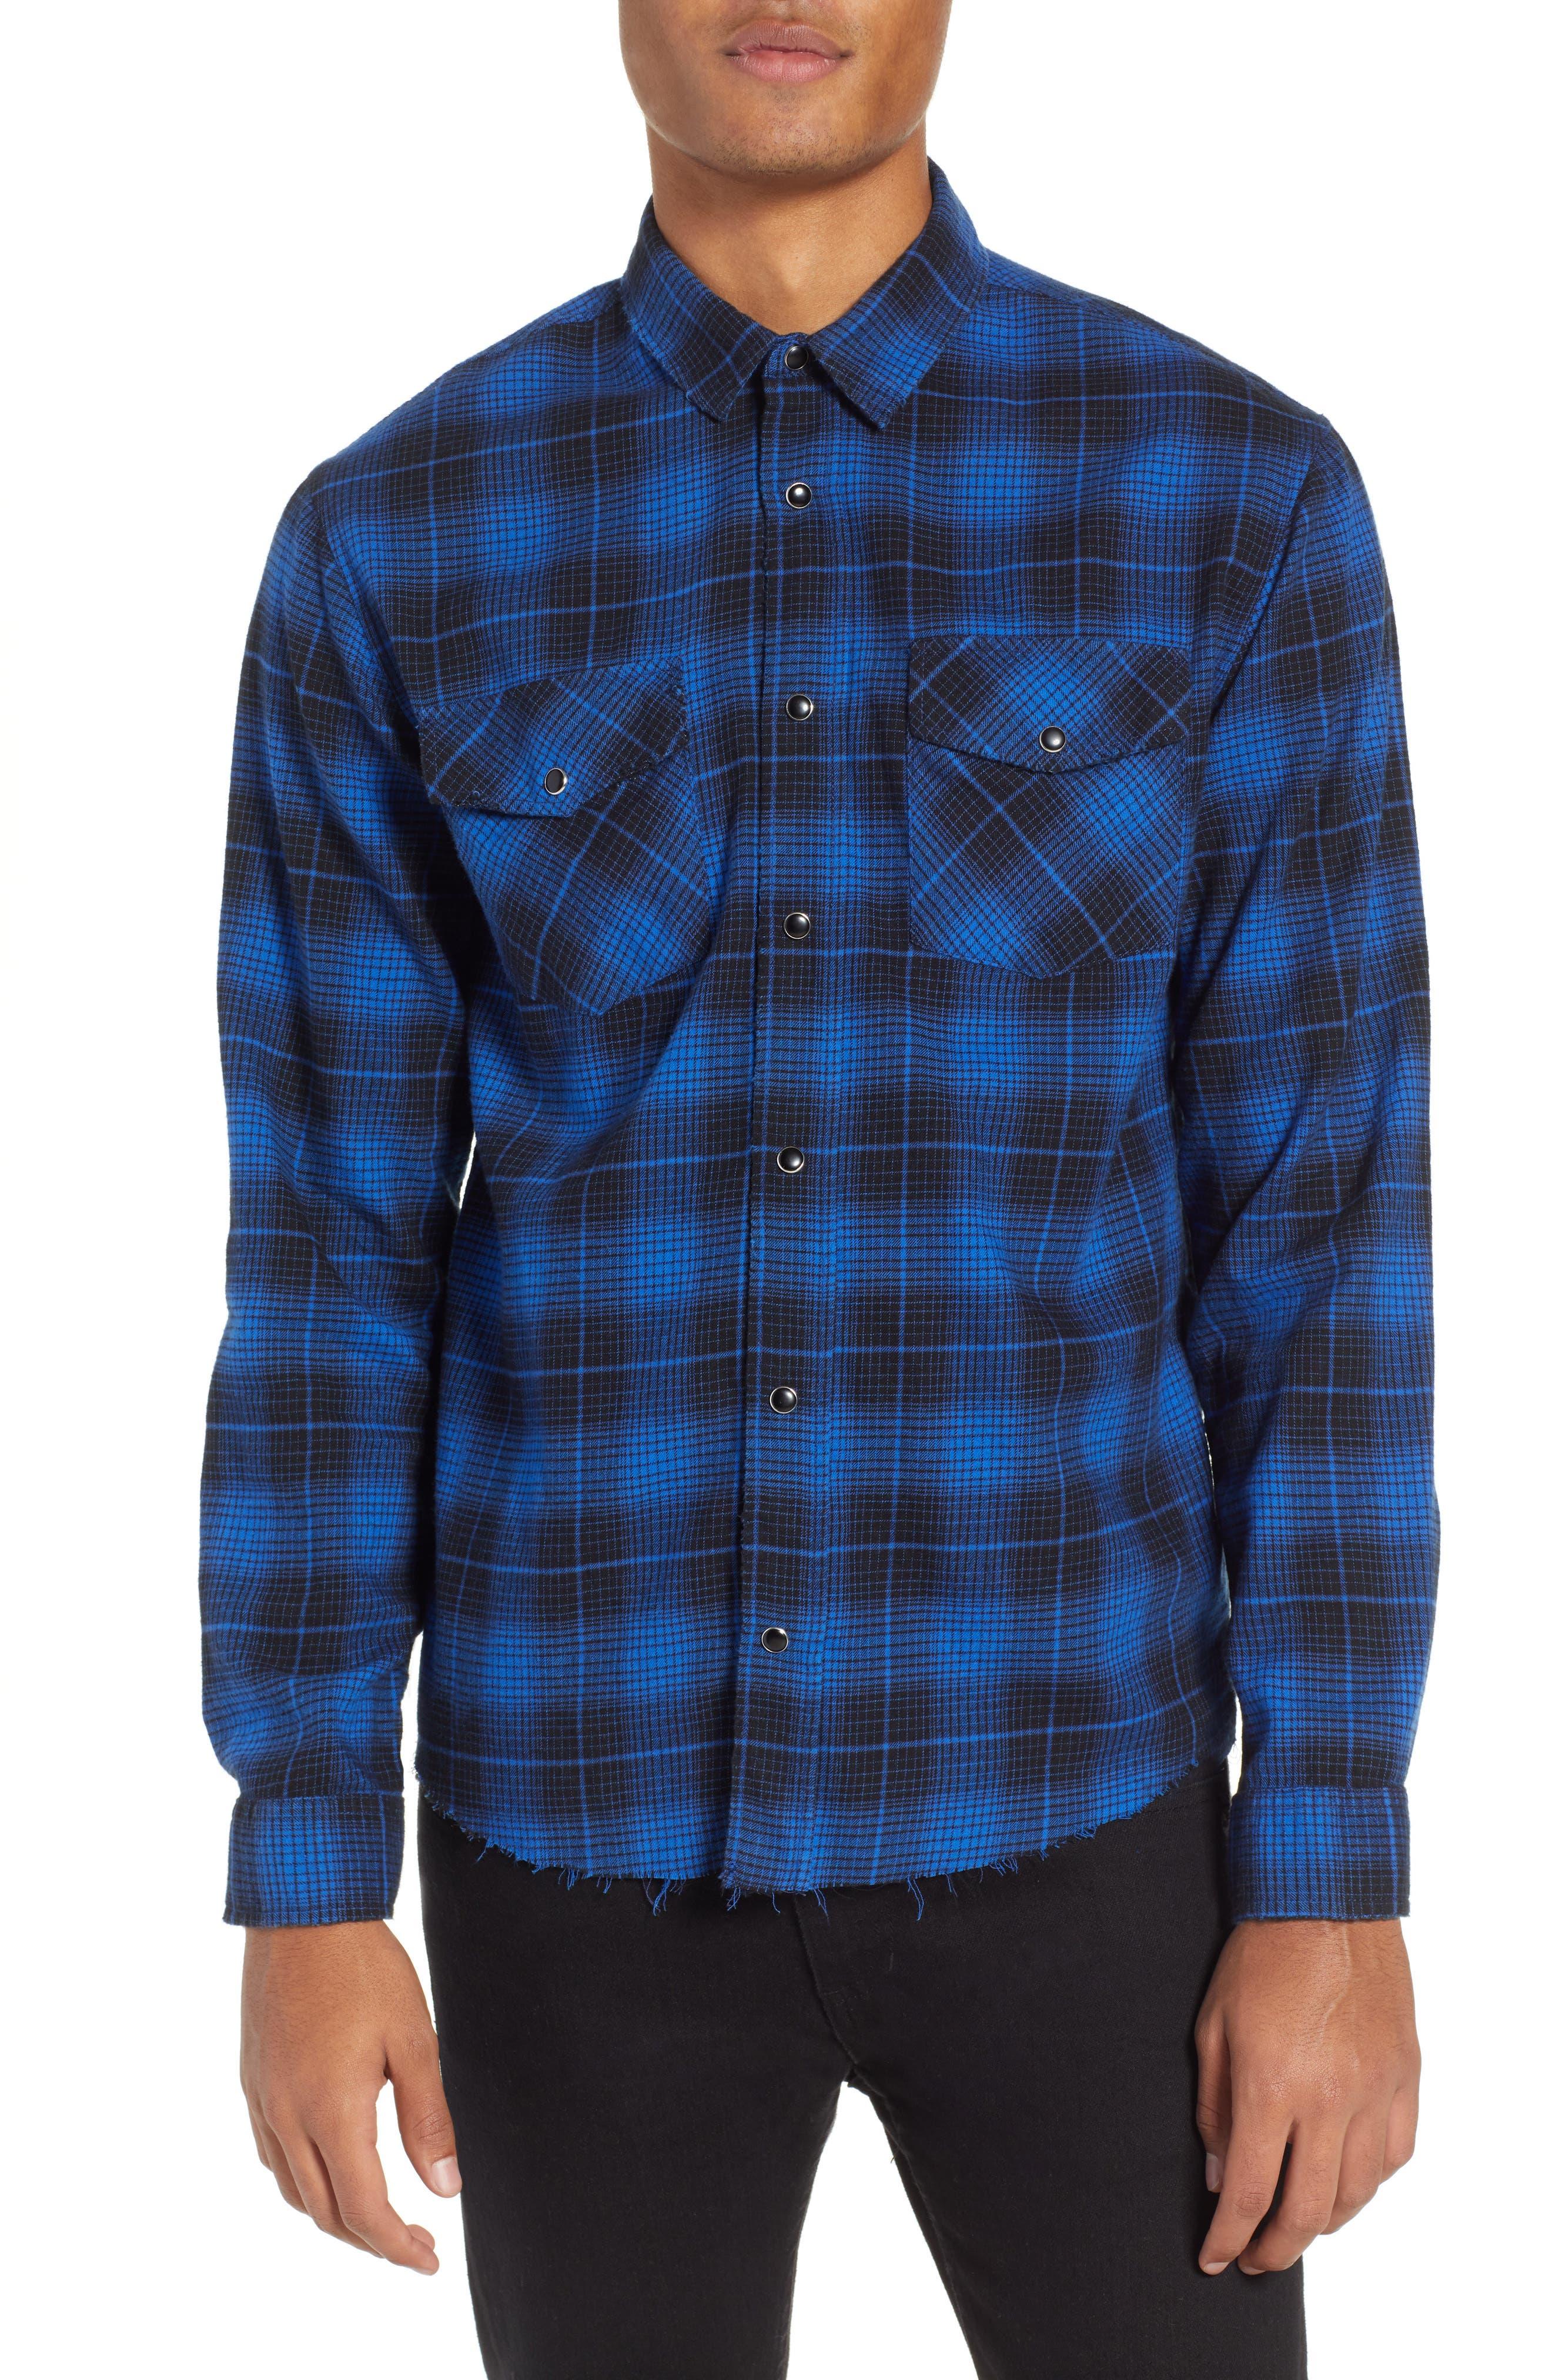 THE KOOPLES, Plaid Flannel Shirt, Main thumbnail 1, color, 400